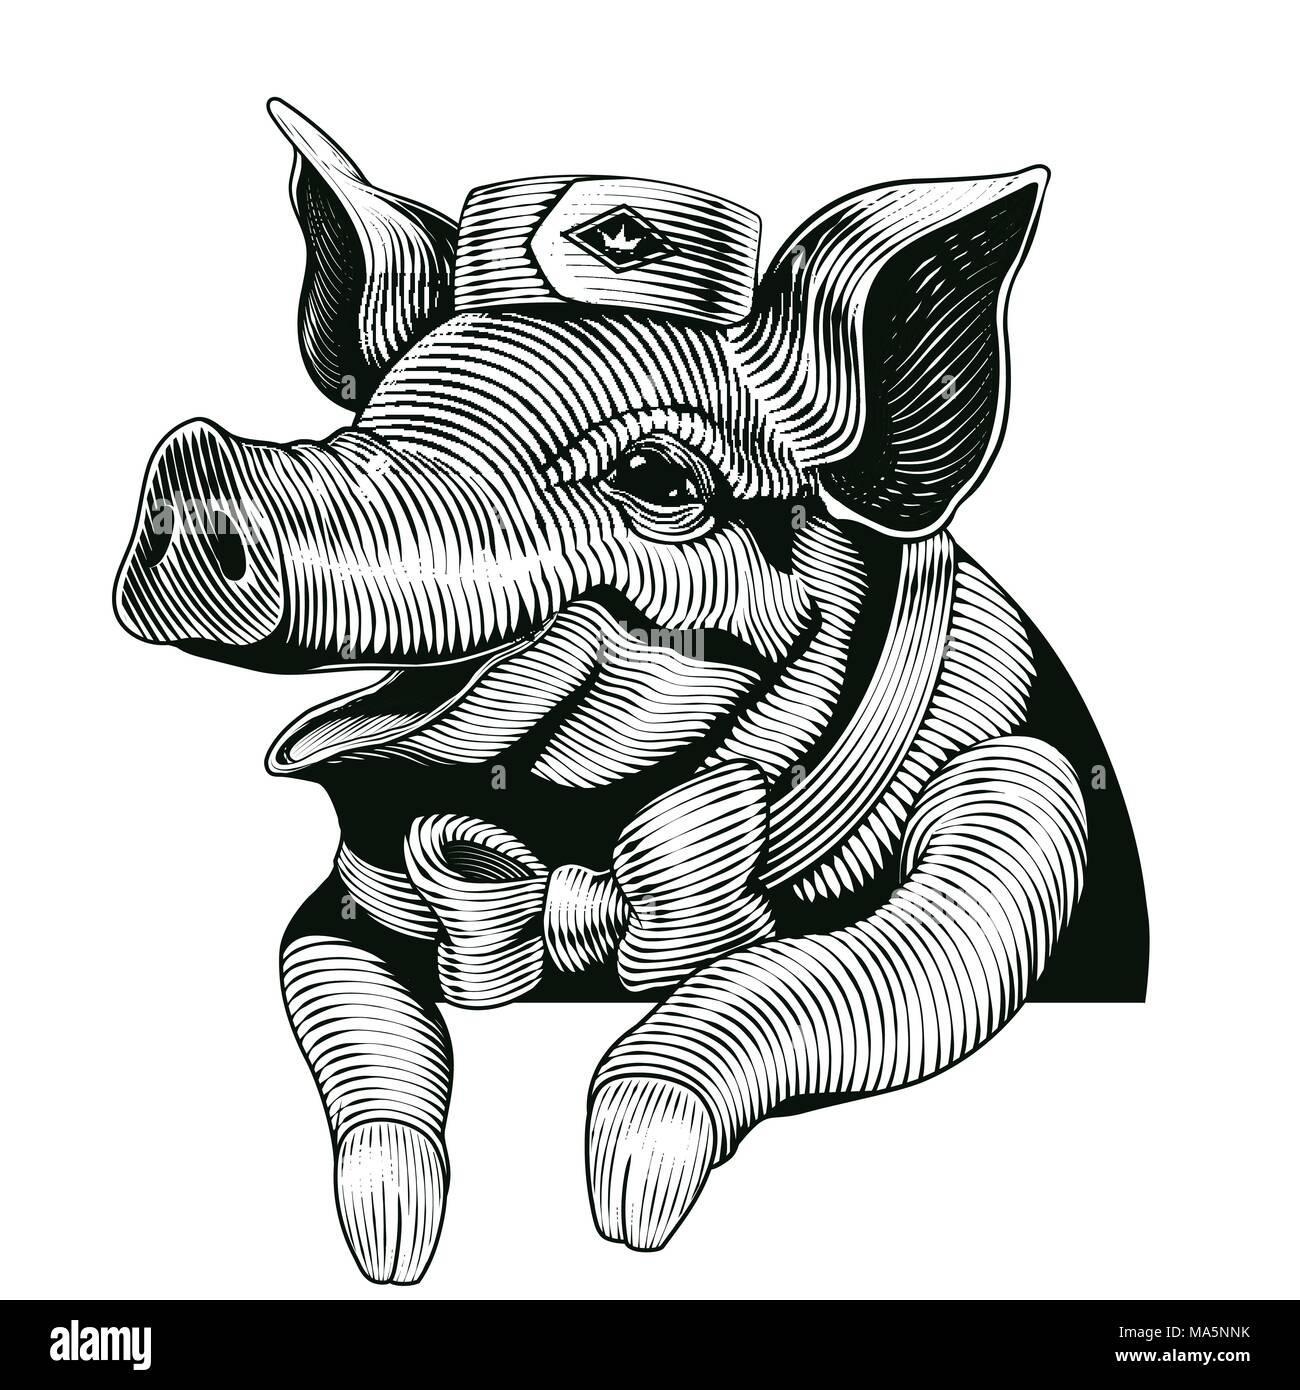 Engraving style pig, smiling pig design elements for delicatessen shop Stock Vector